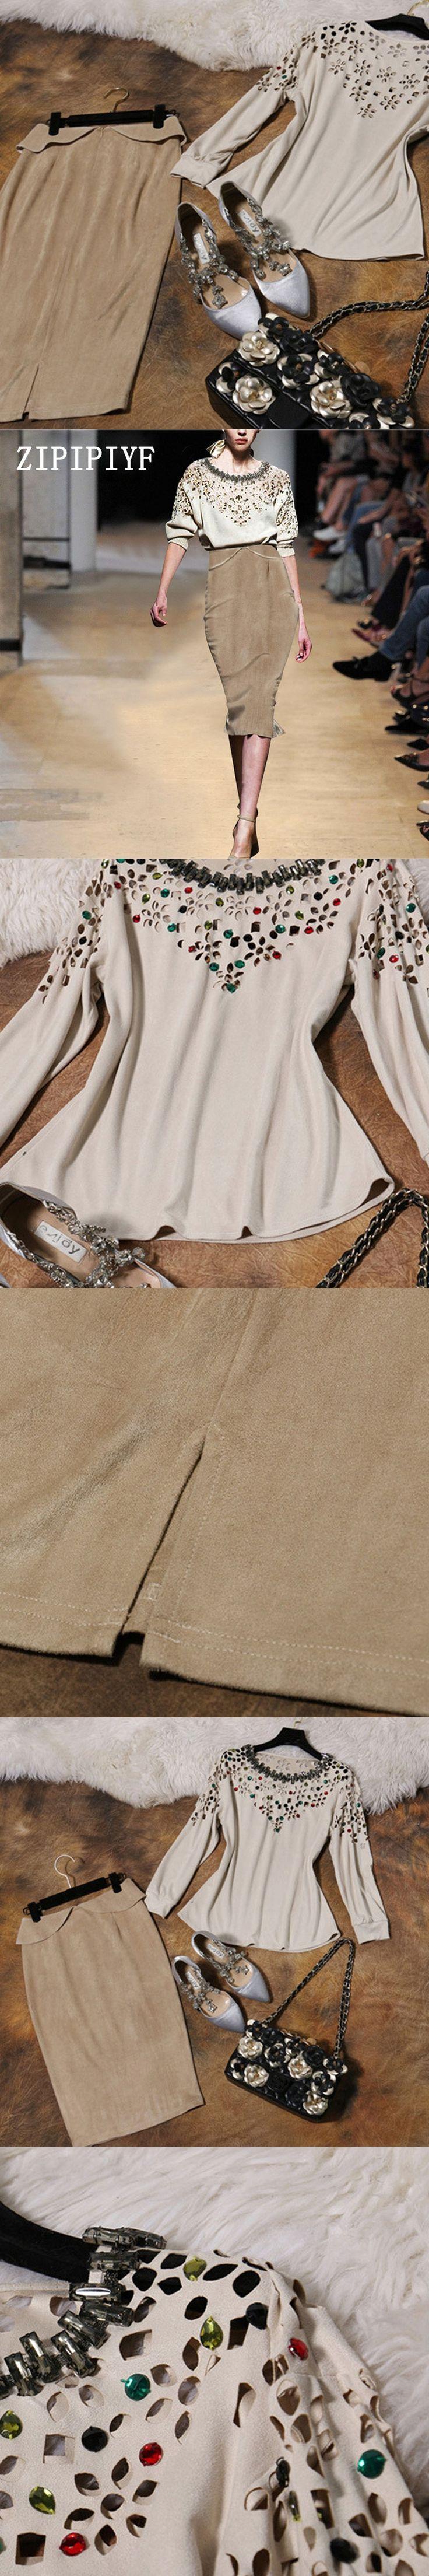 ZIPIPIYF 2 Piece Set Women Suit 2017 New Autumn Winter white Loose T-shirt Tops and Long Skirts Crop Top and Skirt Vestidos